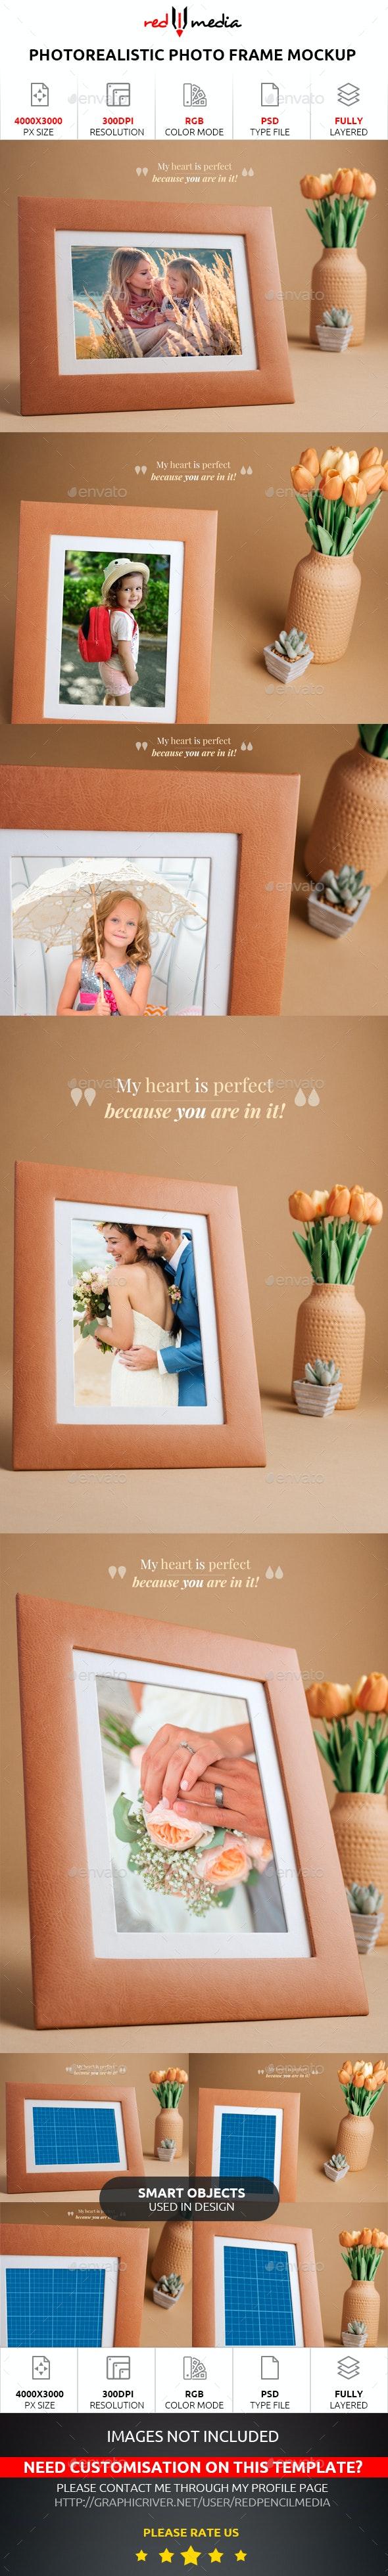 Photorealistic Photo Frame Mockup - Miscellaneous Product Mock-Ups